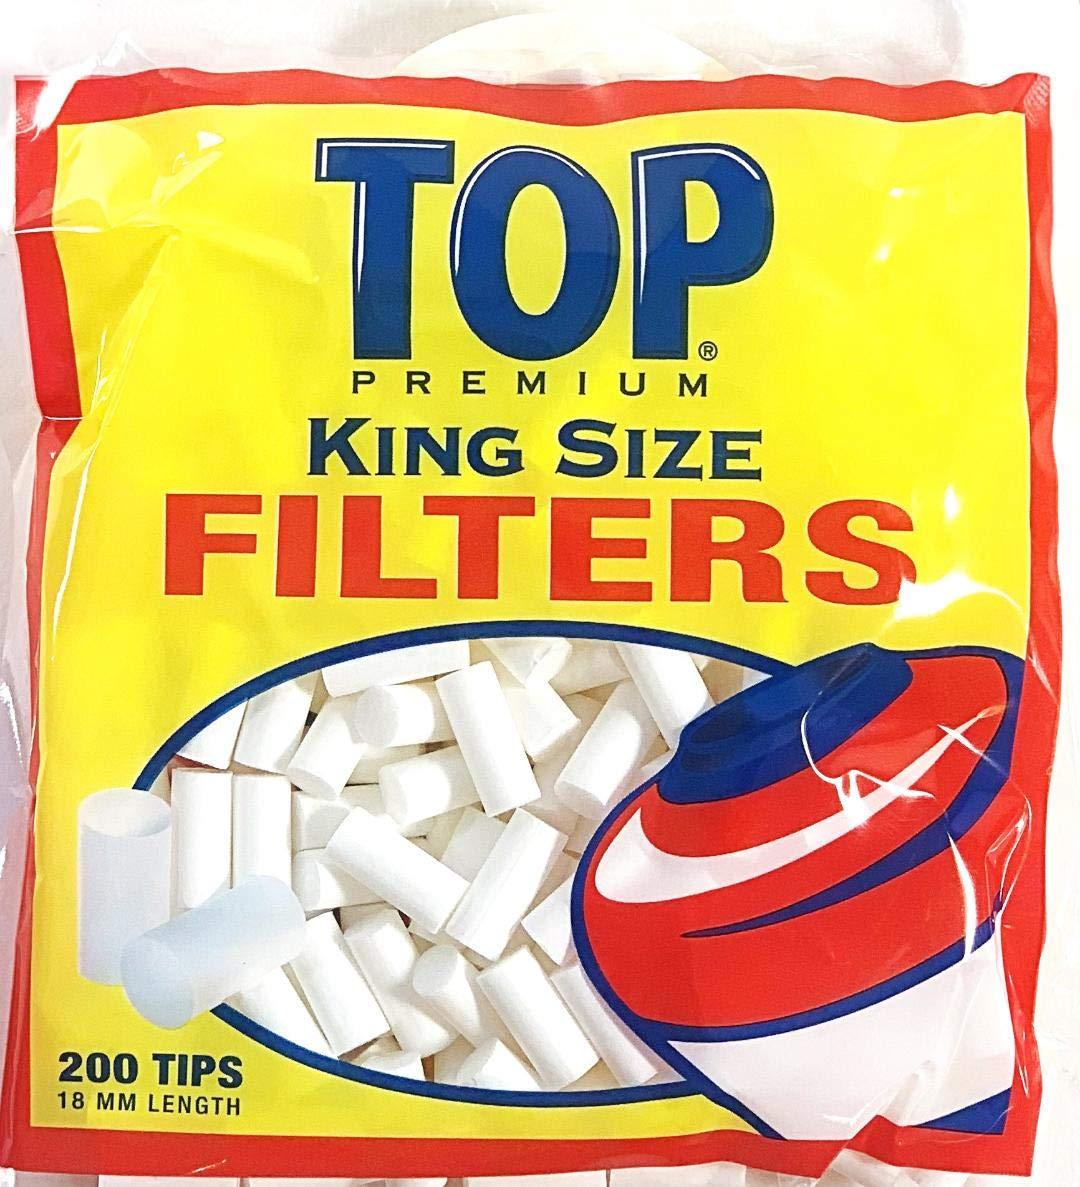 Top Premium Cigarette Filter Tips King Size 18mm 200 Pack